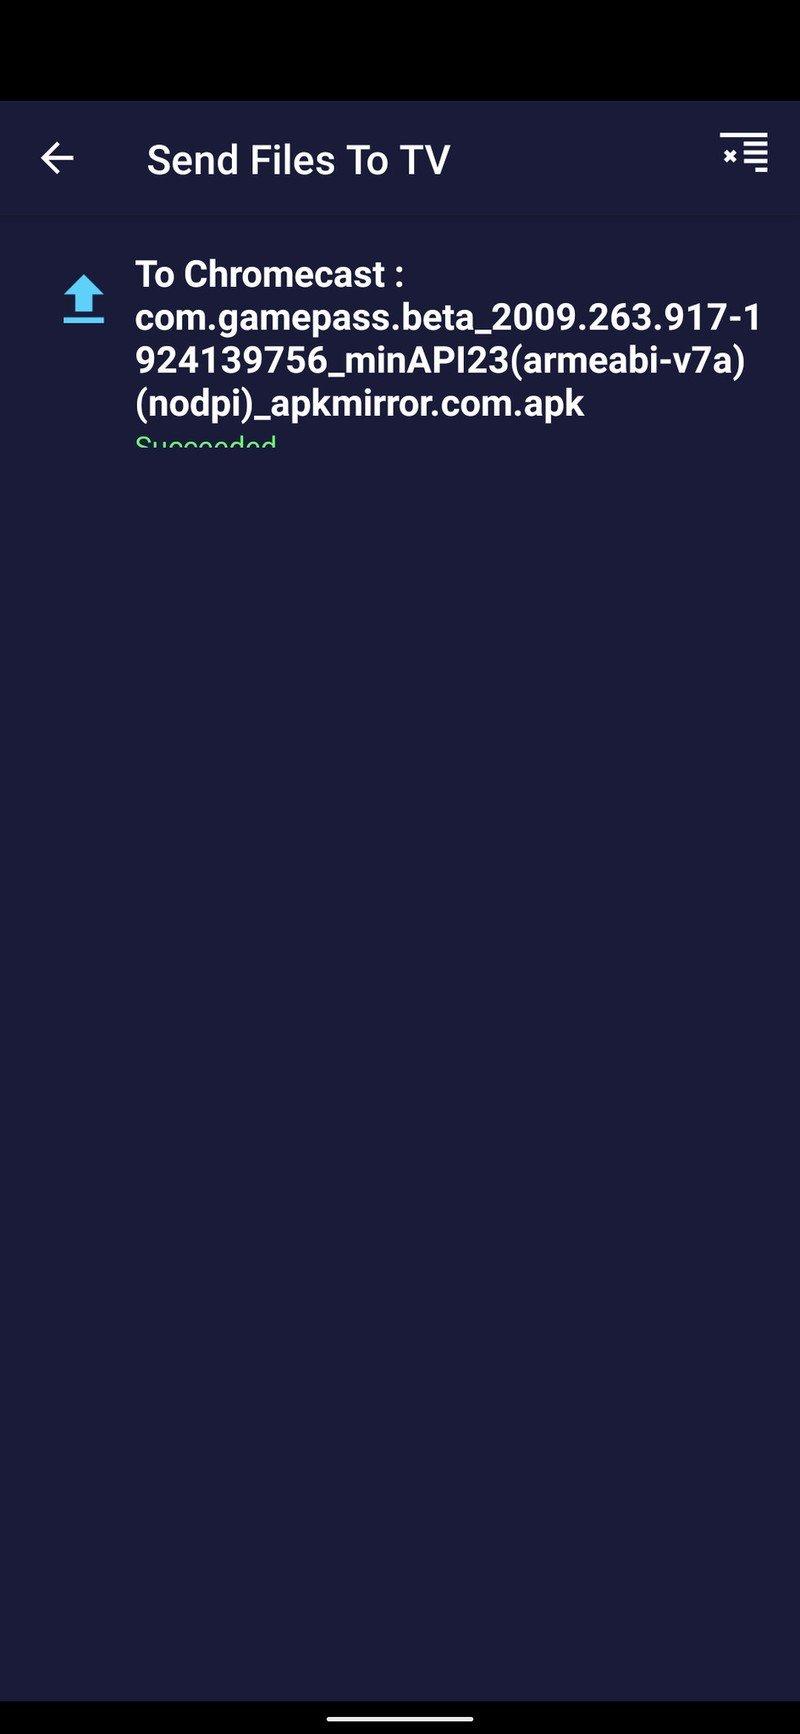 xbox-game-pass-android-tv-phone-6.jpg